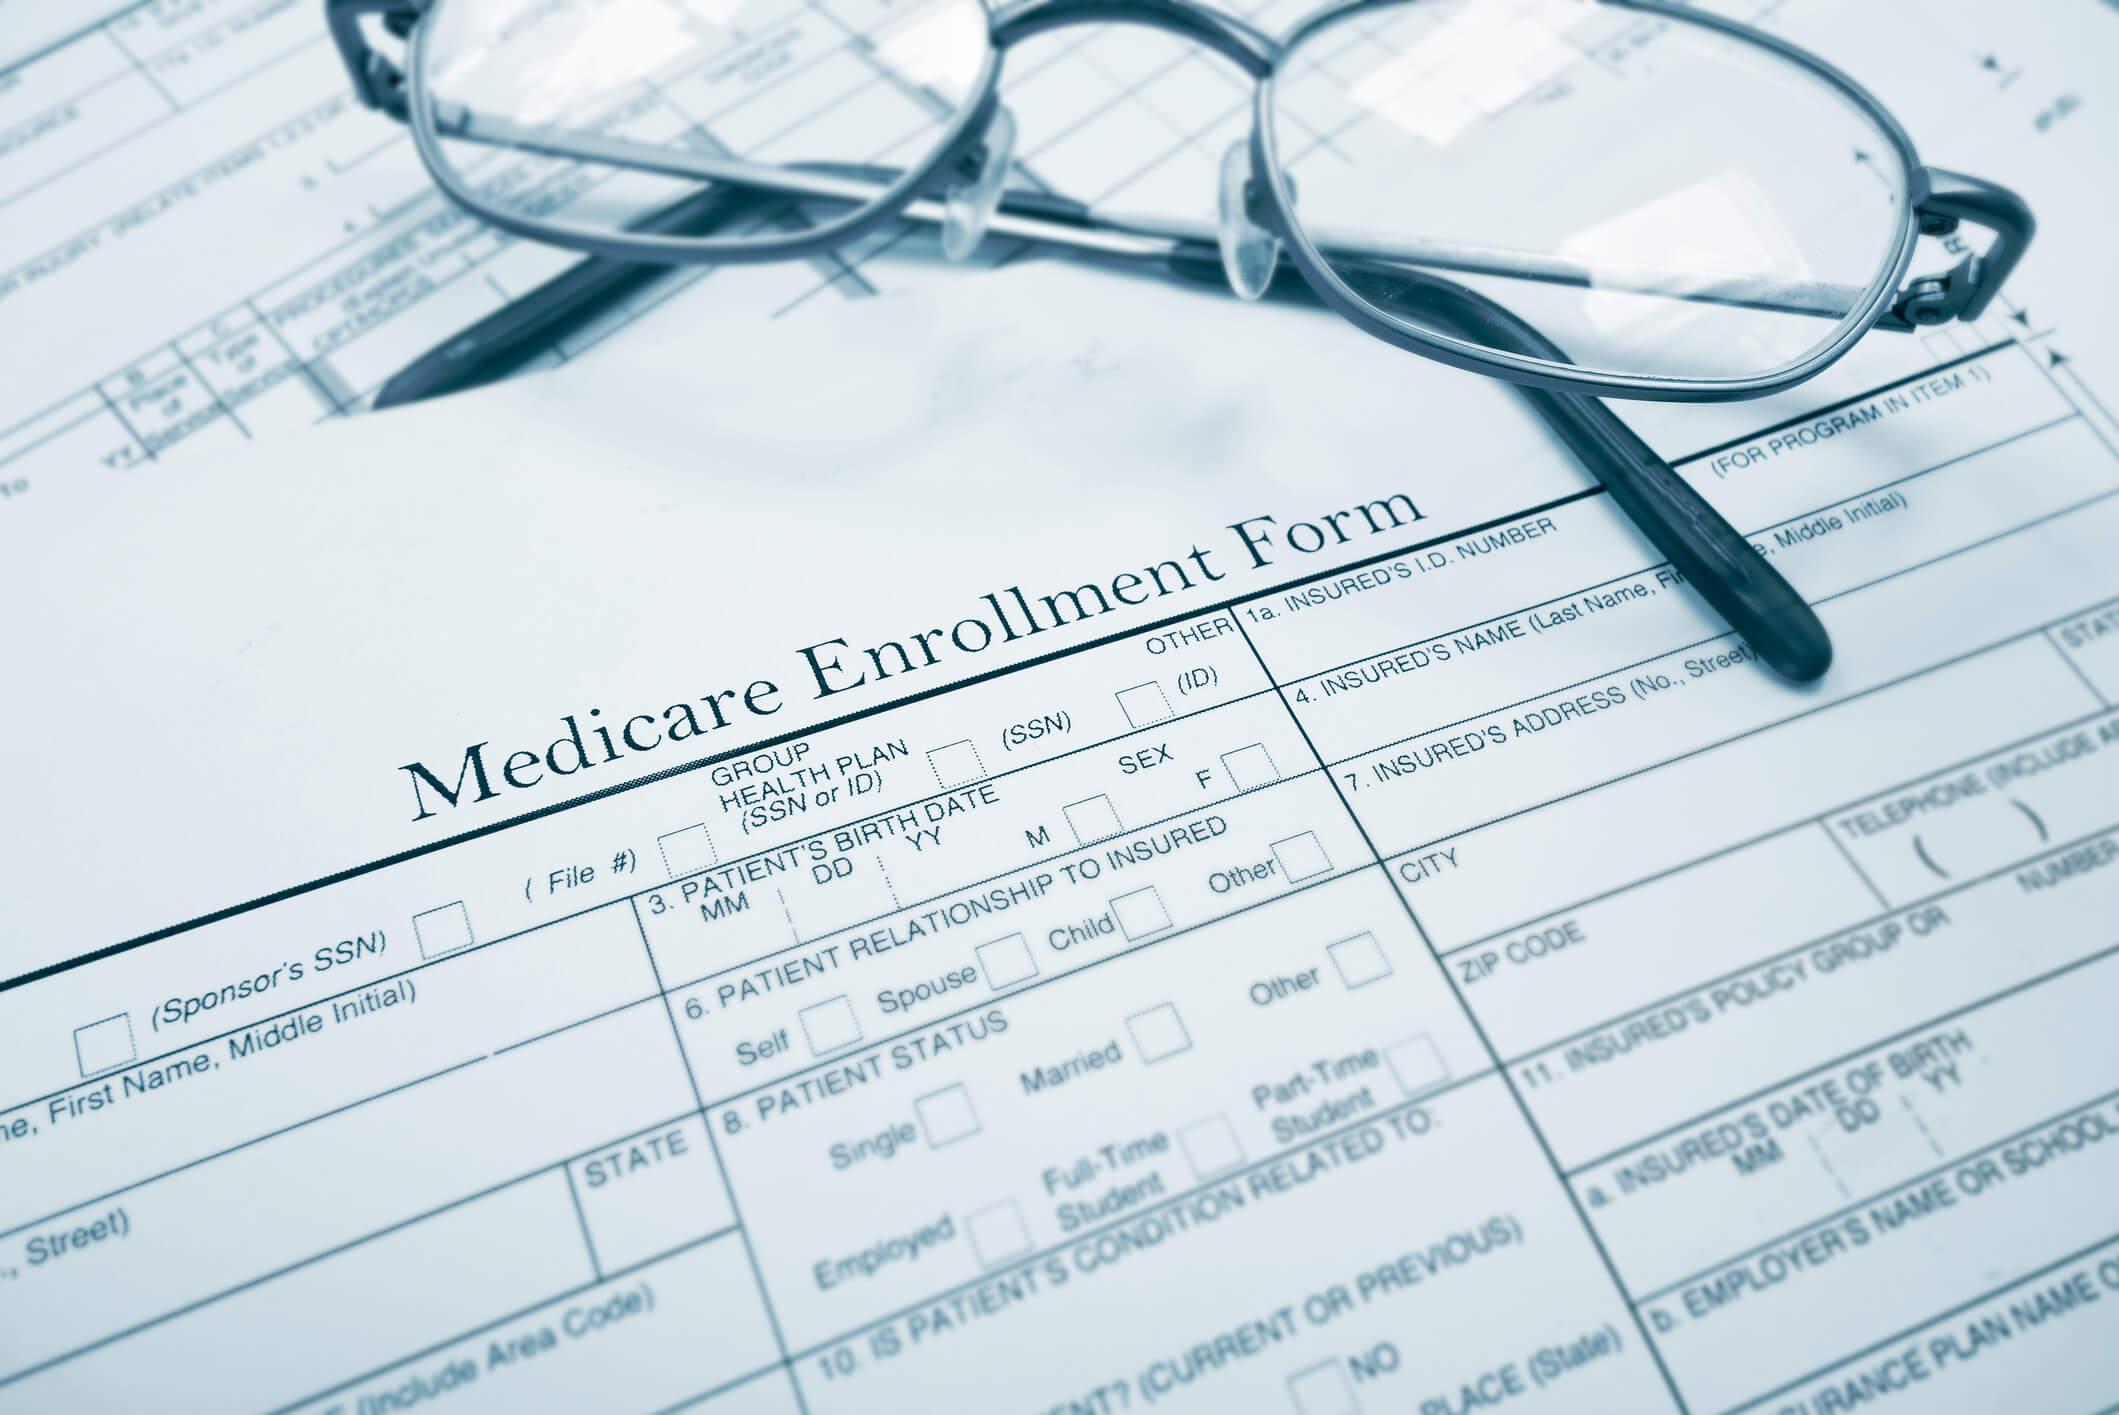 CMS lifts sanctions on Cigna's Medicare plans | FierceHealthcare